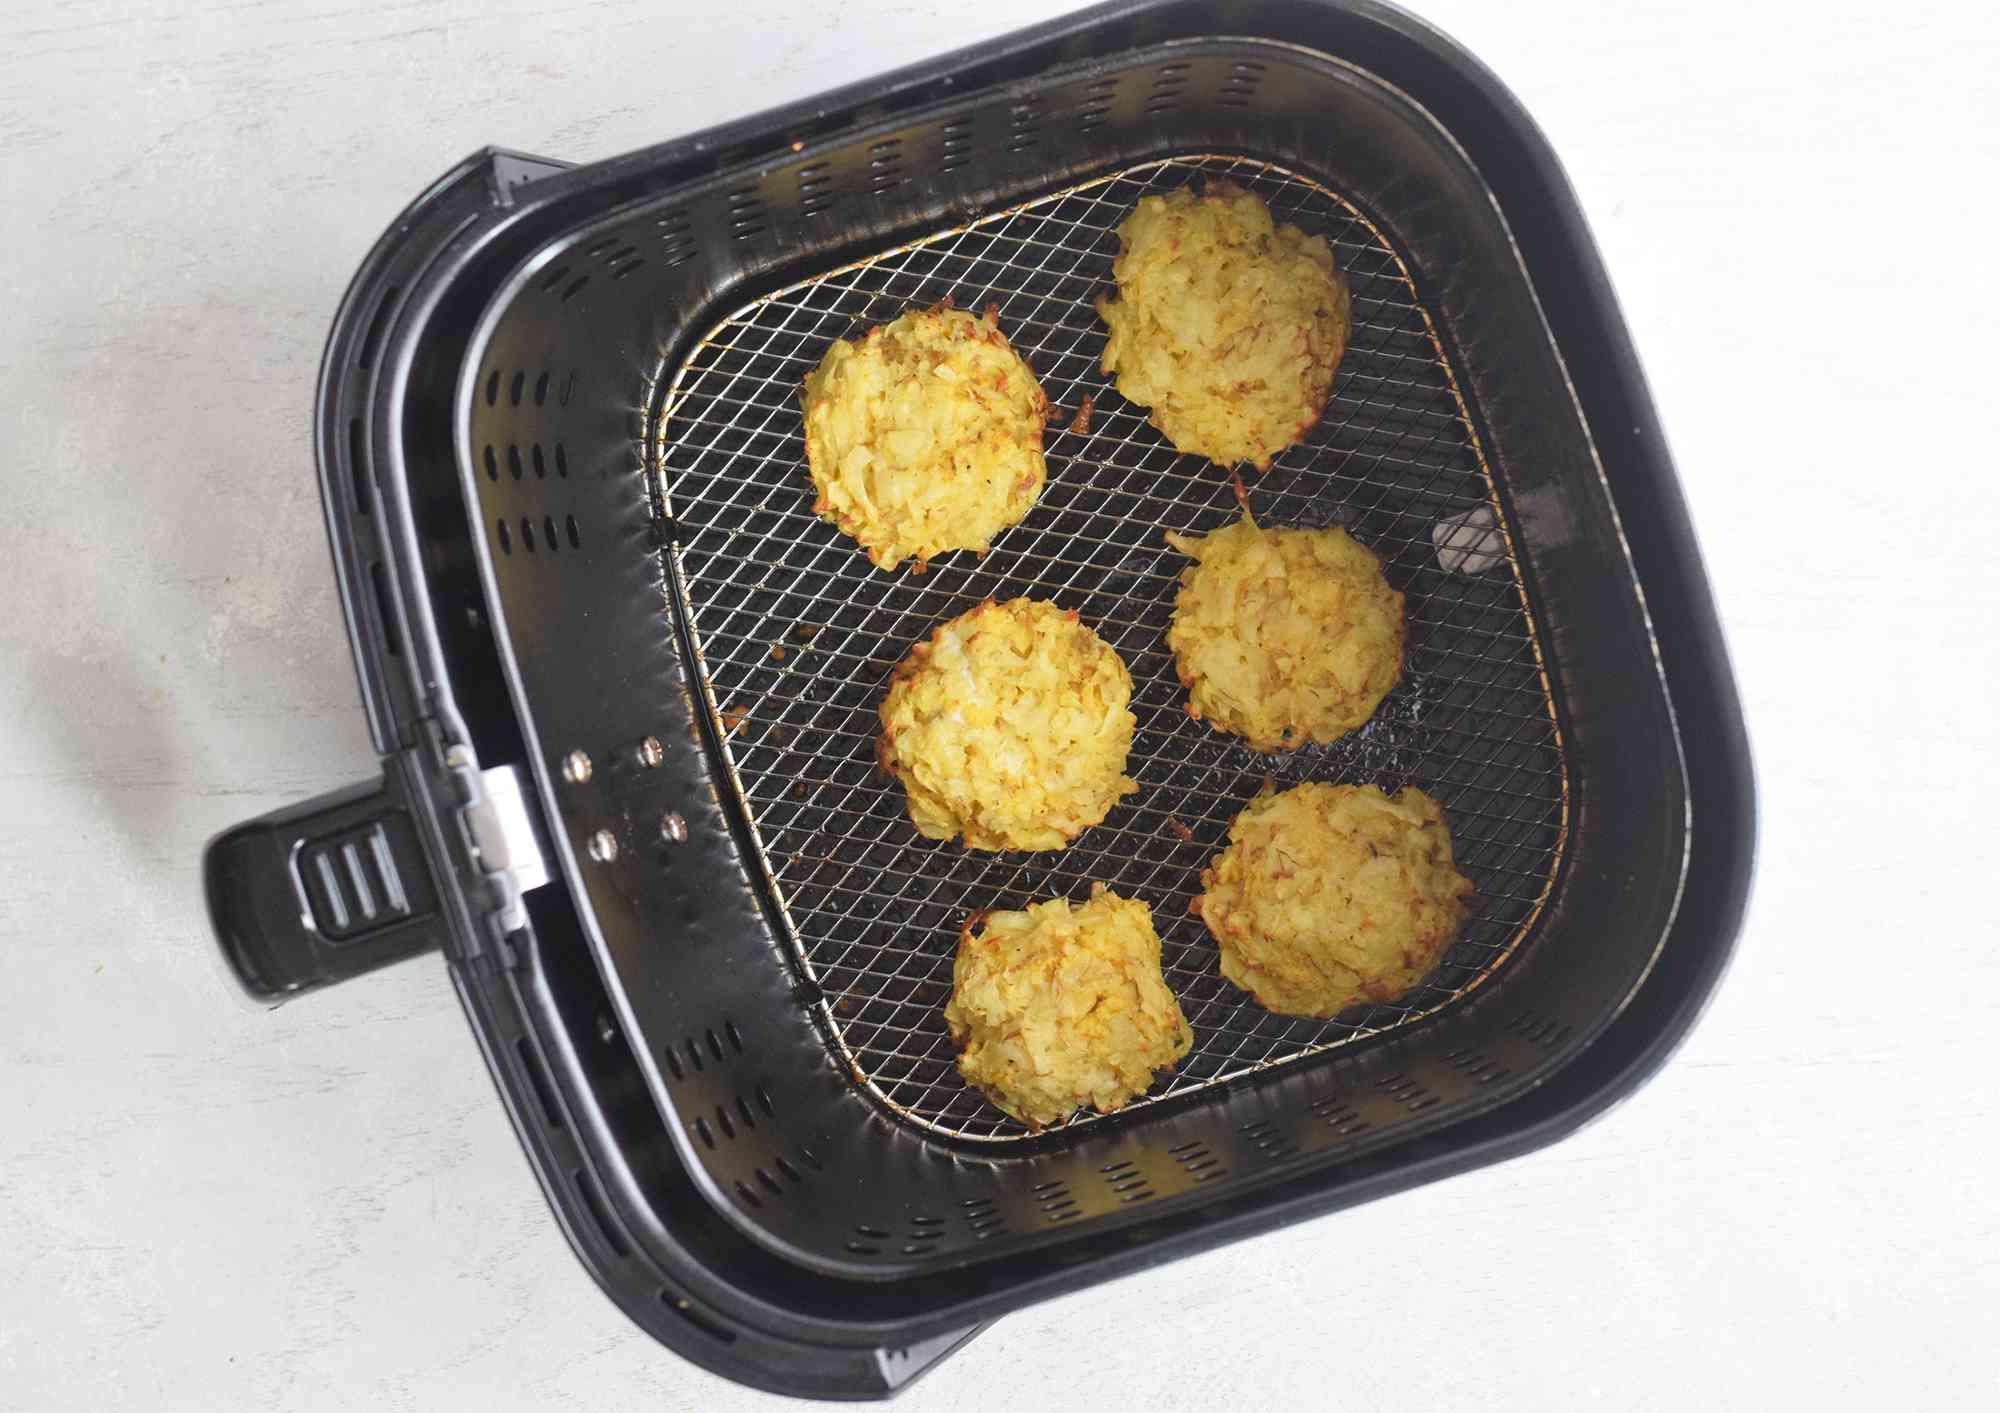 Latkes browning in an air fryer